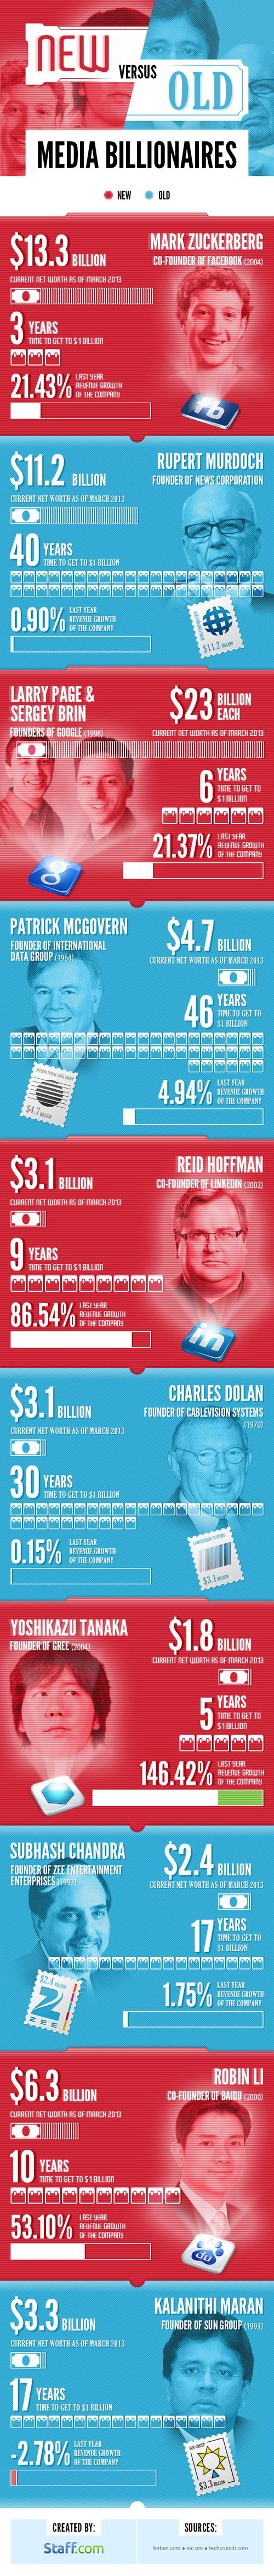 New Media vs Old Media Billionaires Infographic